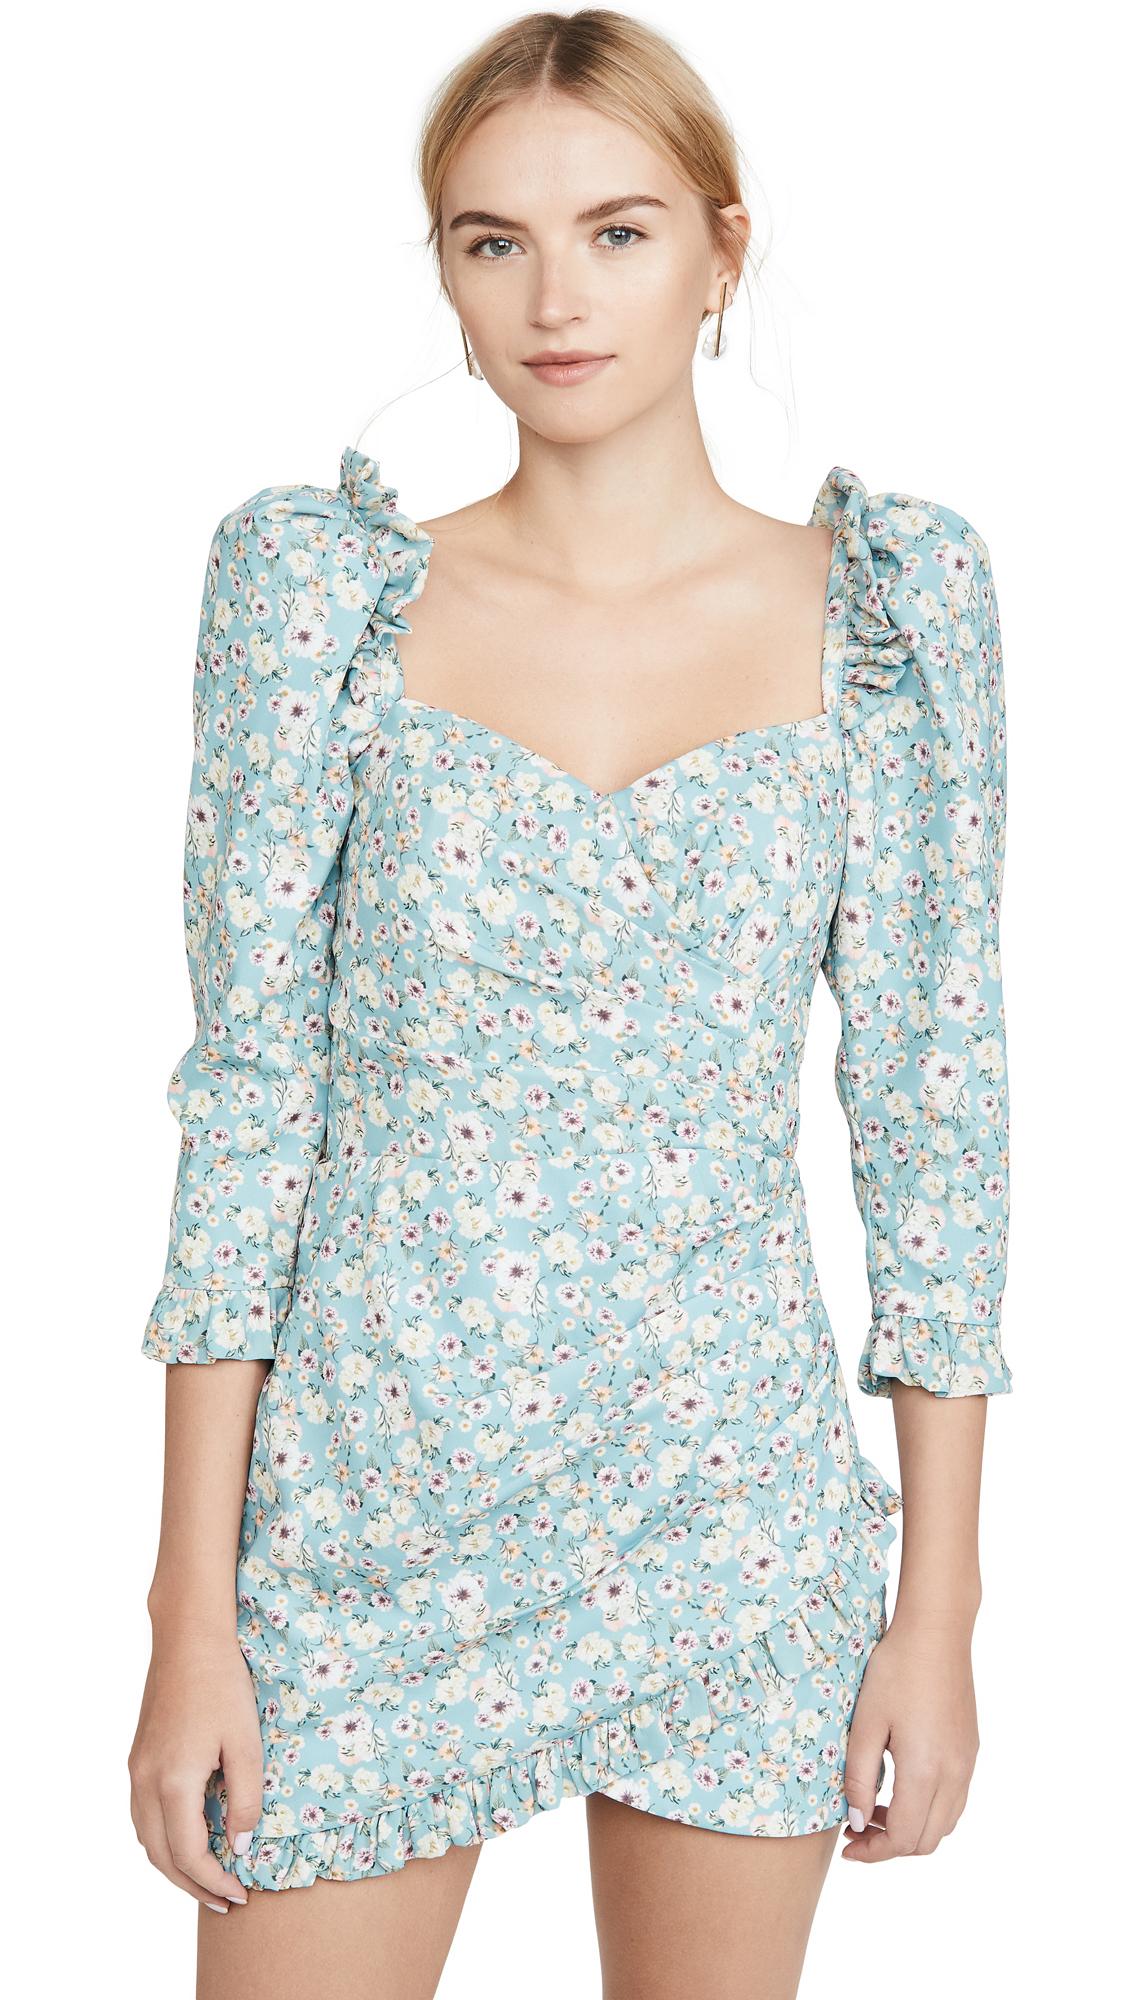 IORANE Liberty Mini Dress - 50% Off Sale